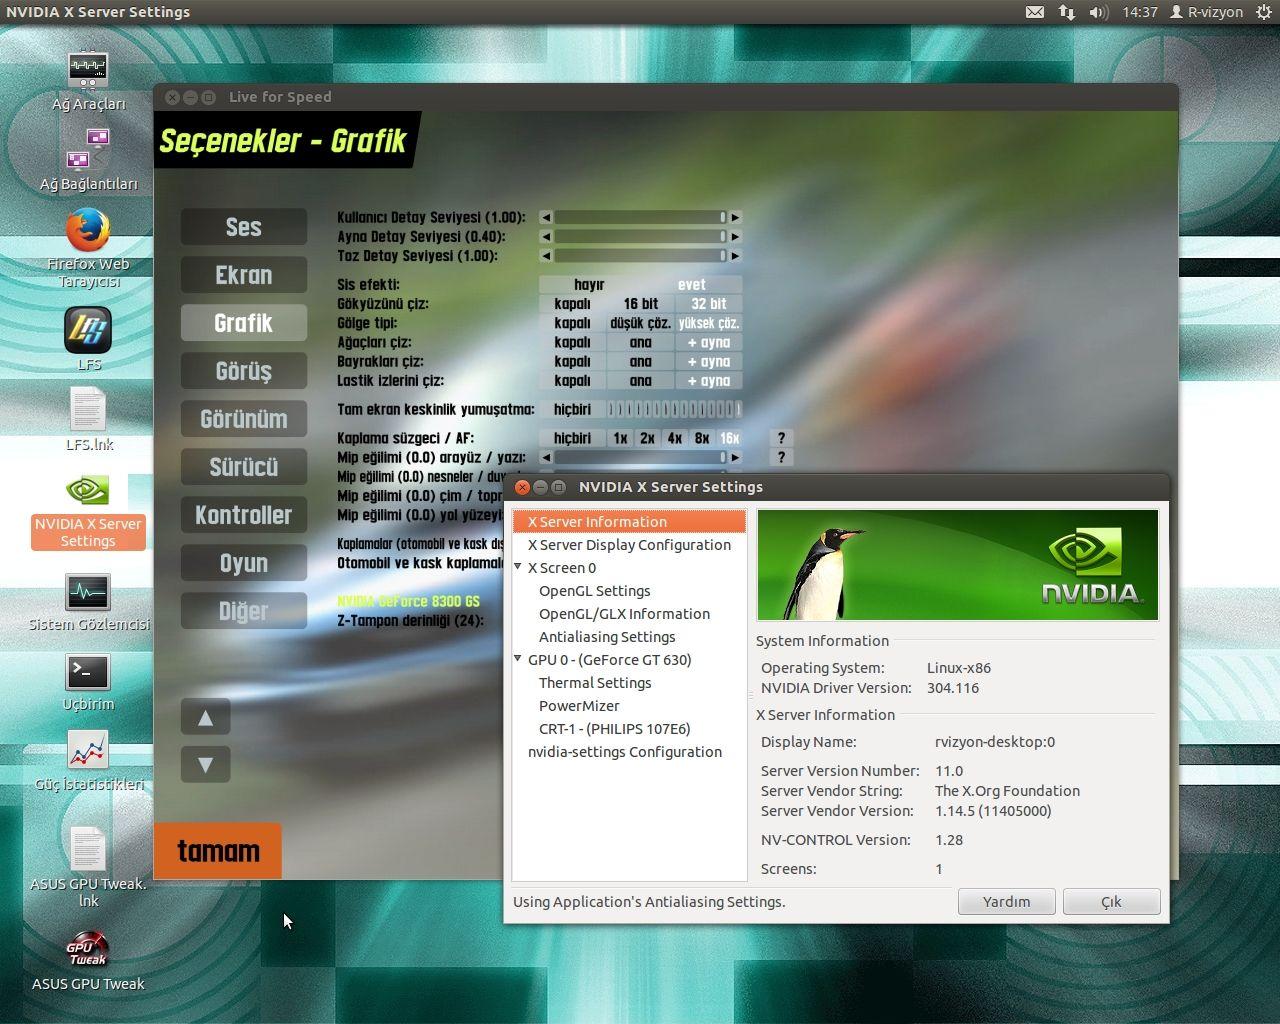 ubuntugt630-jpg.3006